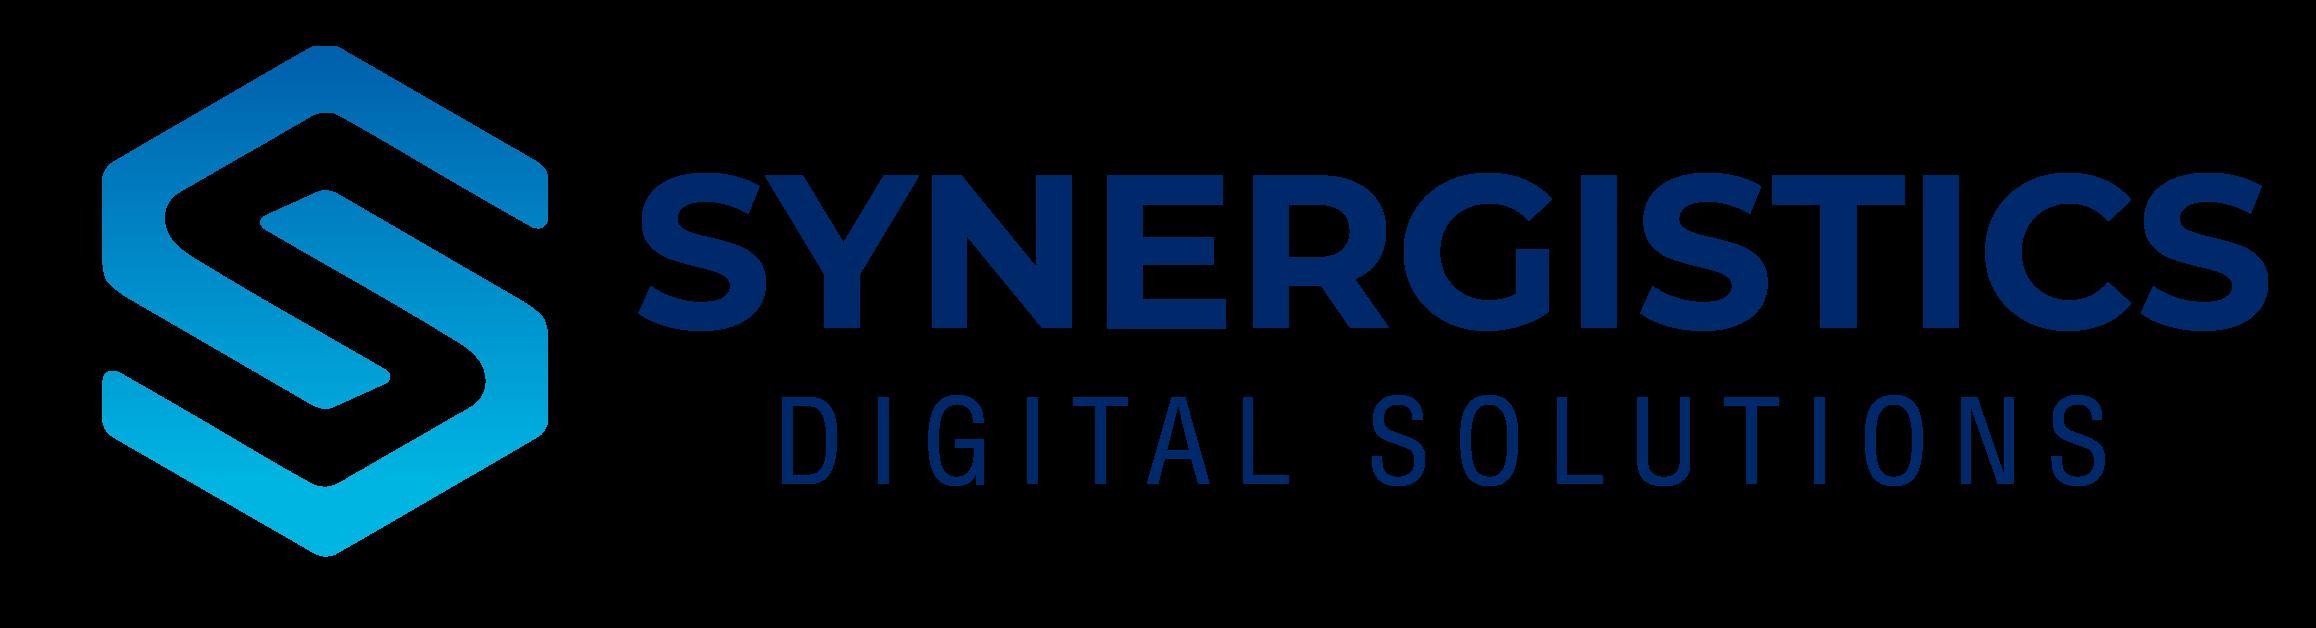 Synergistics